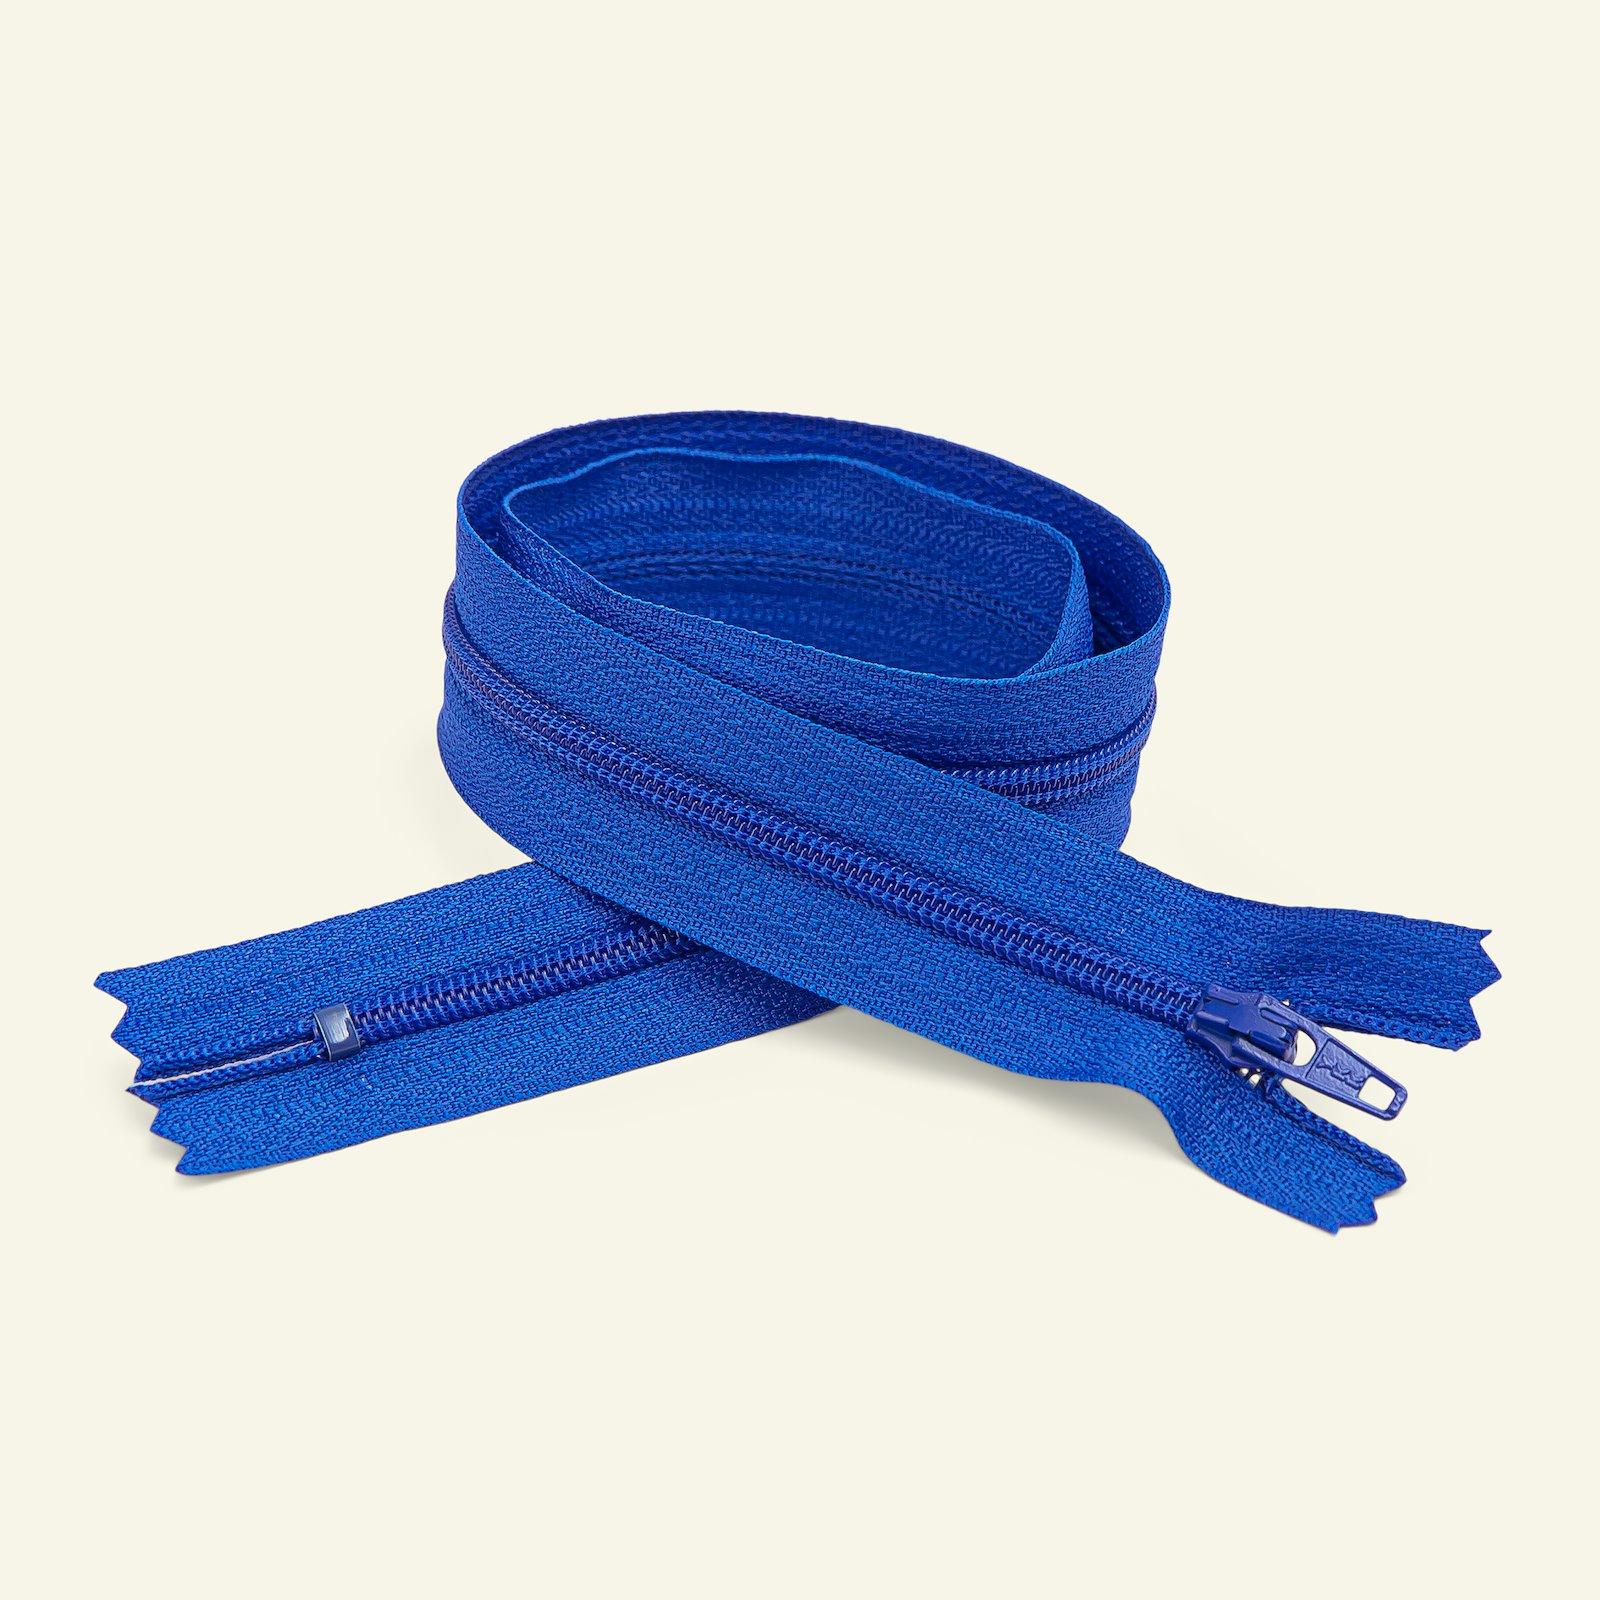 YKK zip 4mm closed end 30cm cobalt x40522_pack